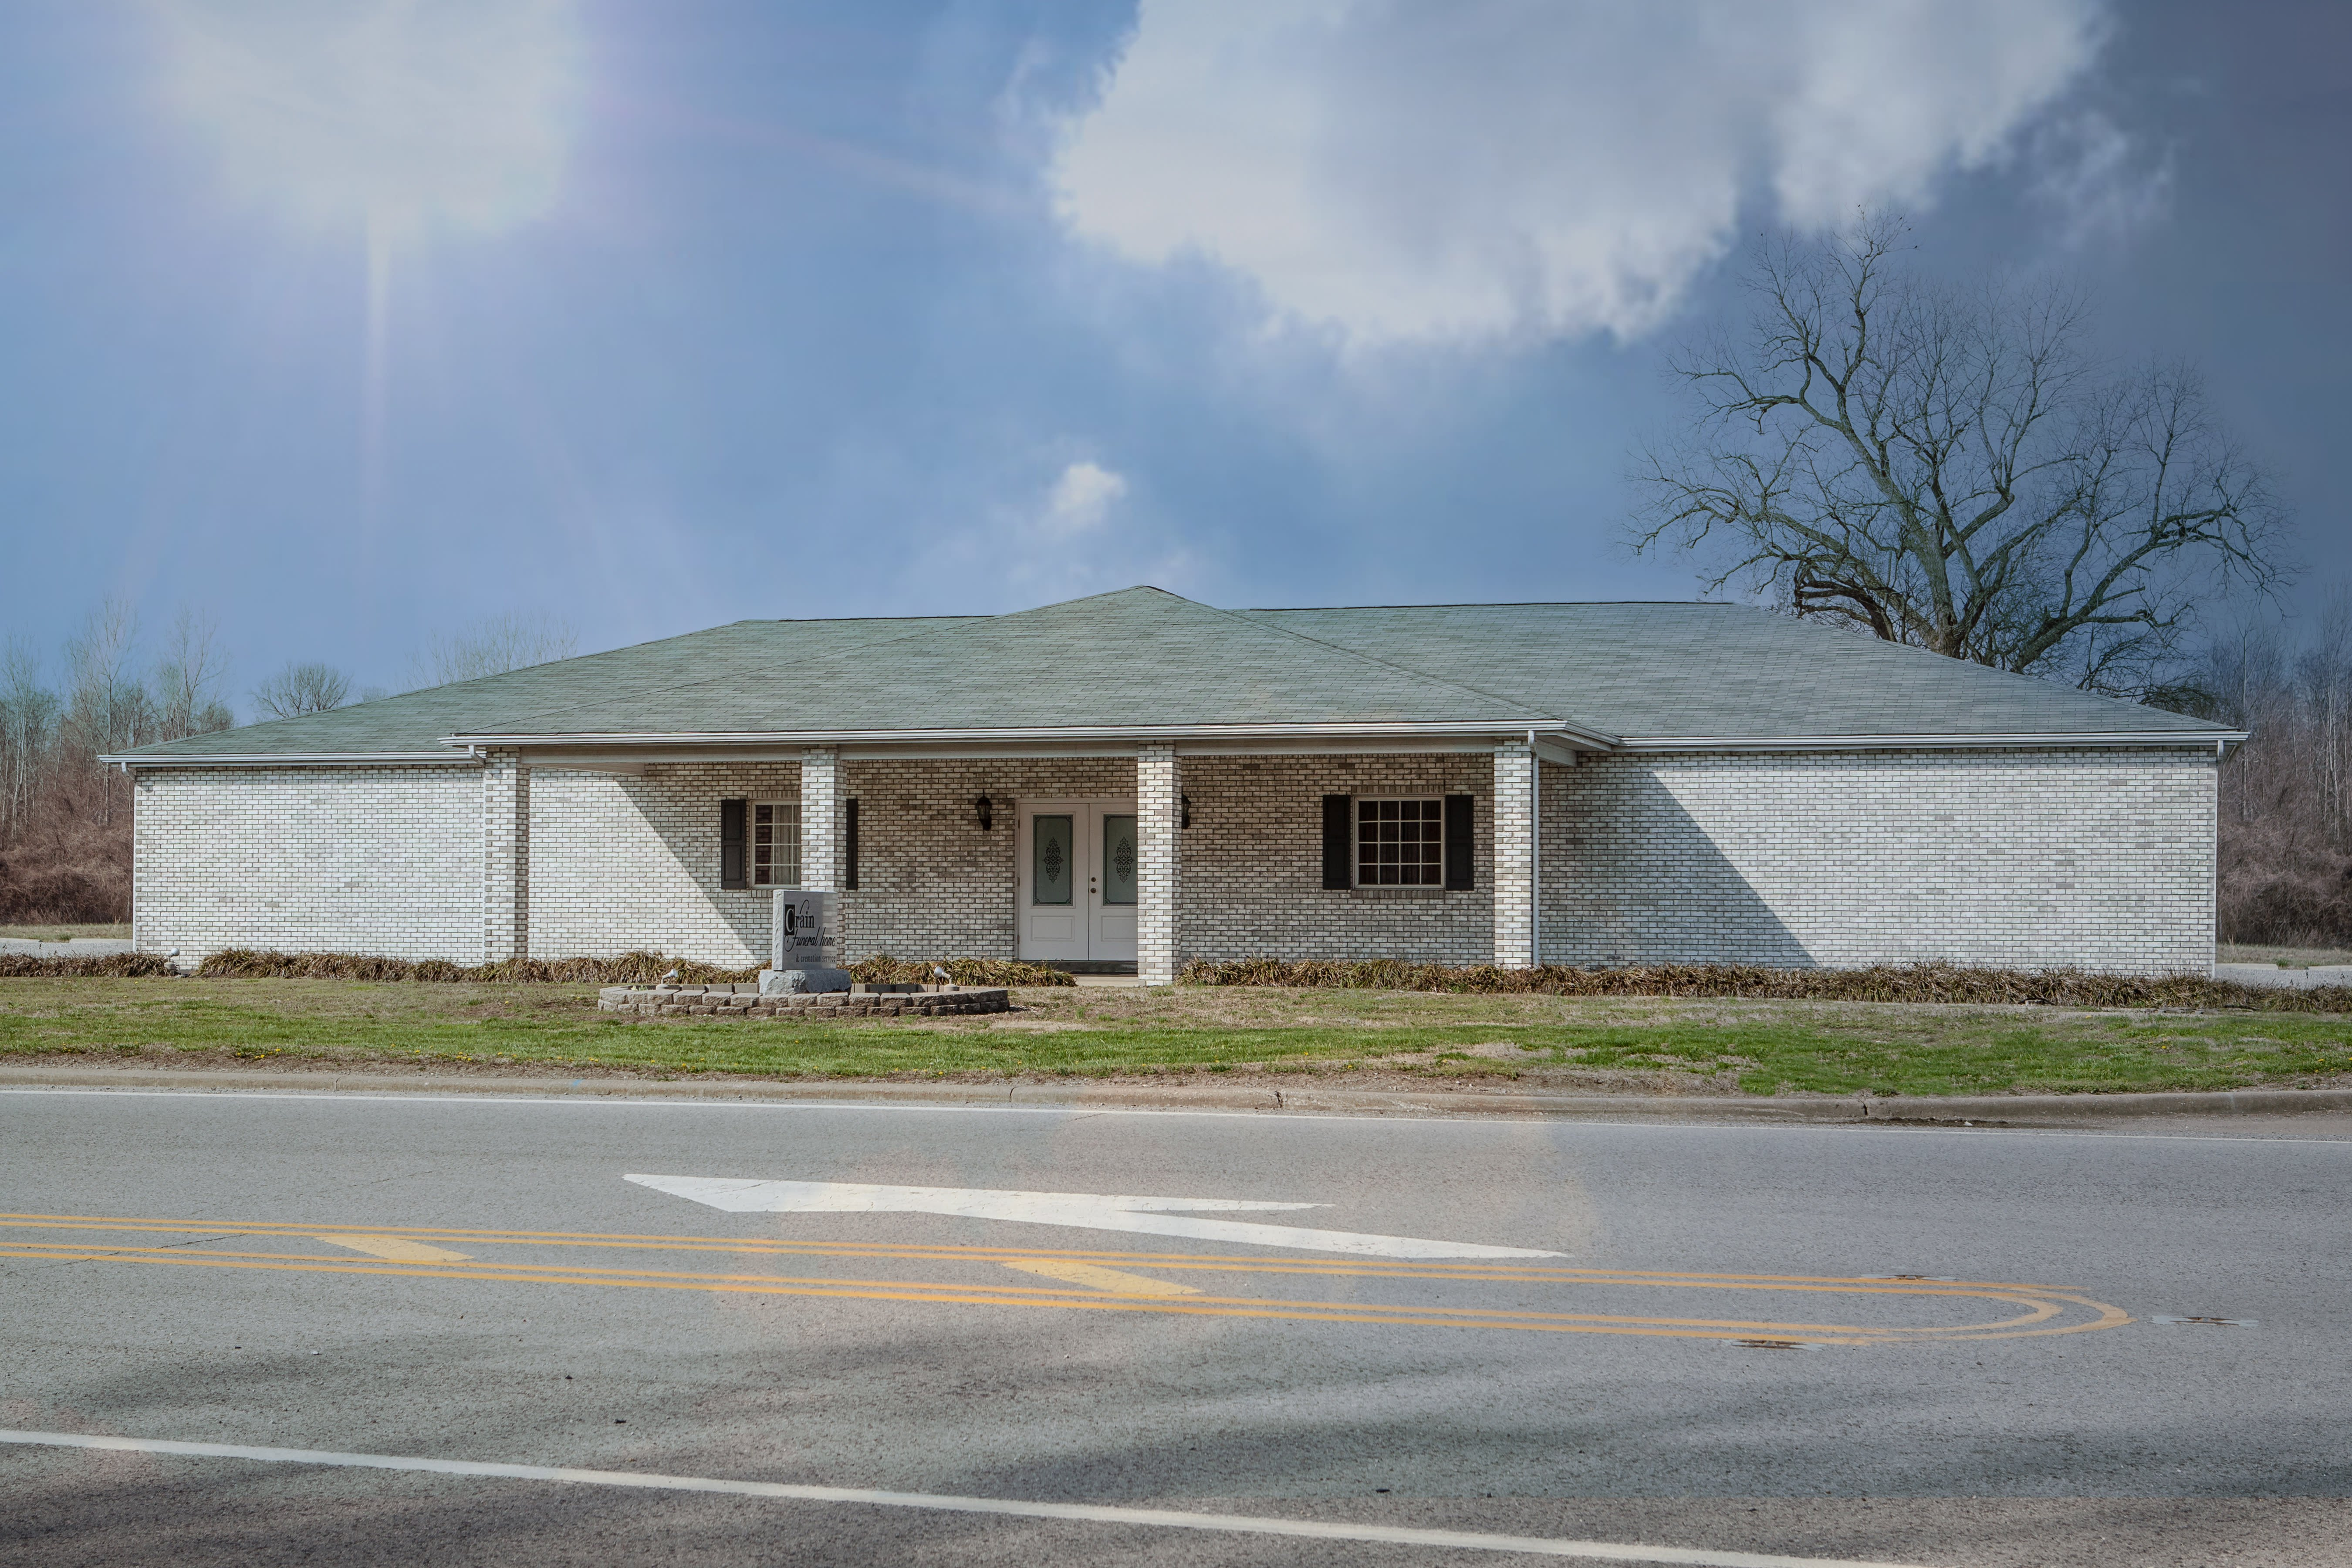 Crain Funeral Home - Cape Girardeau, MO